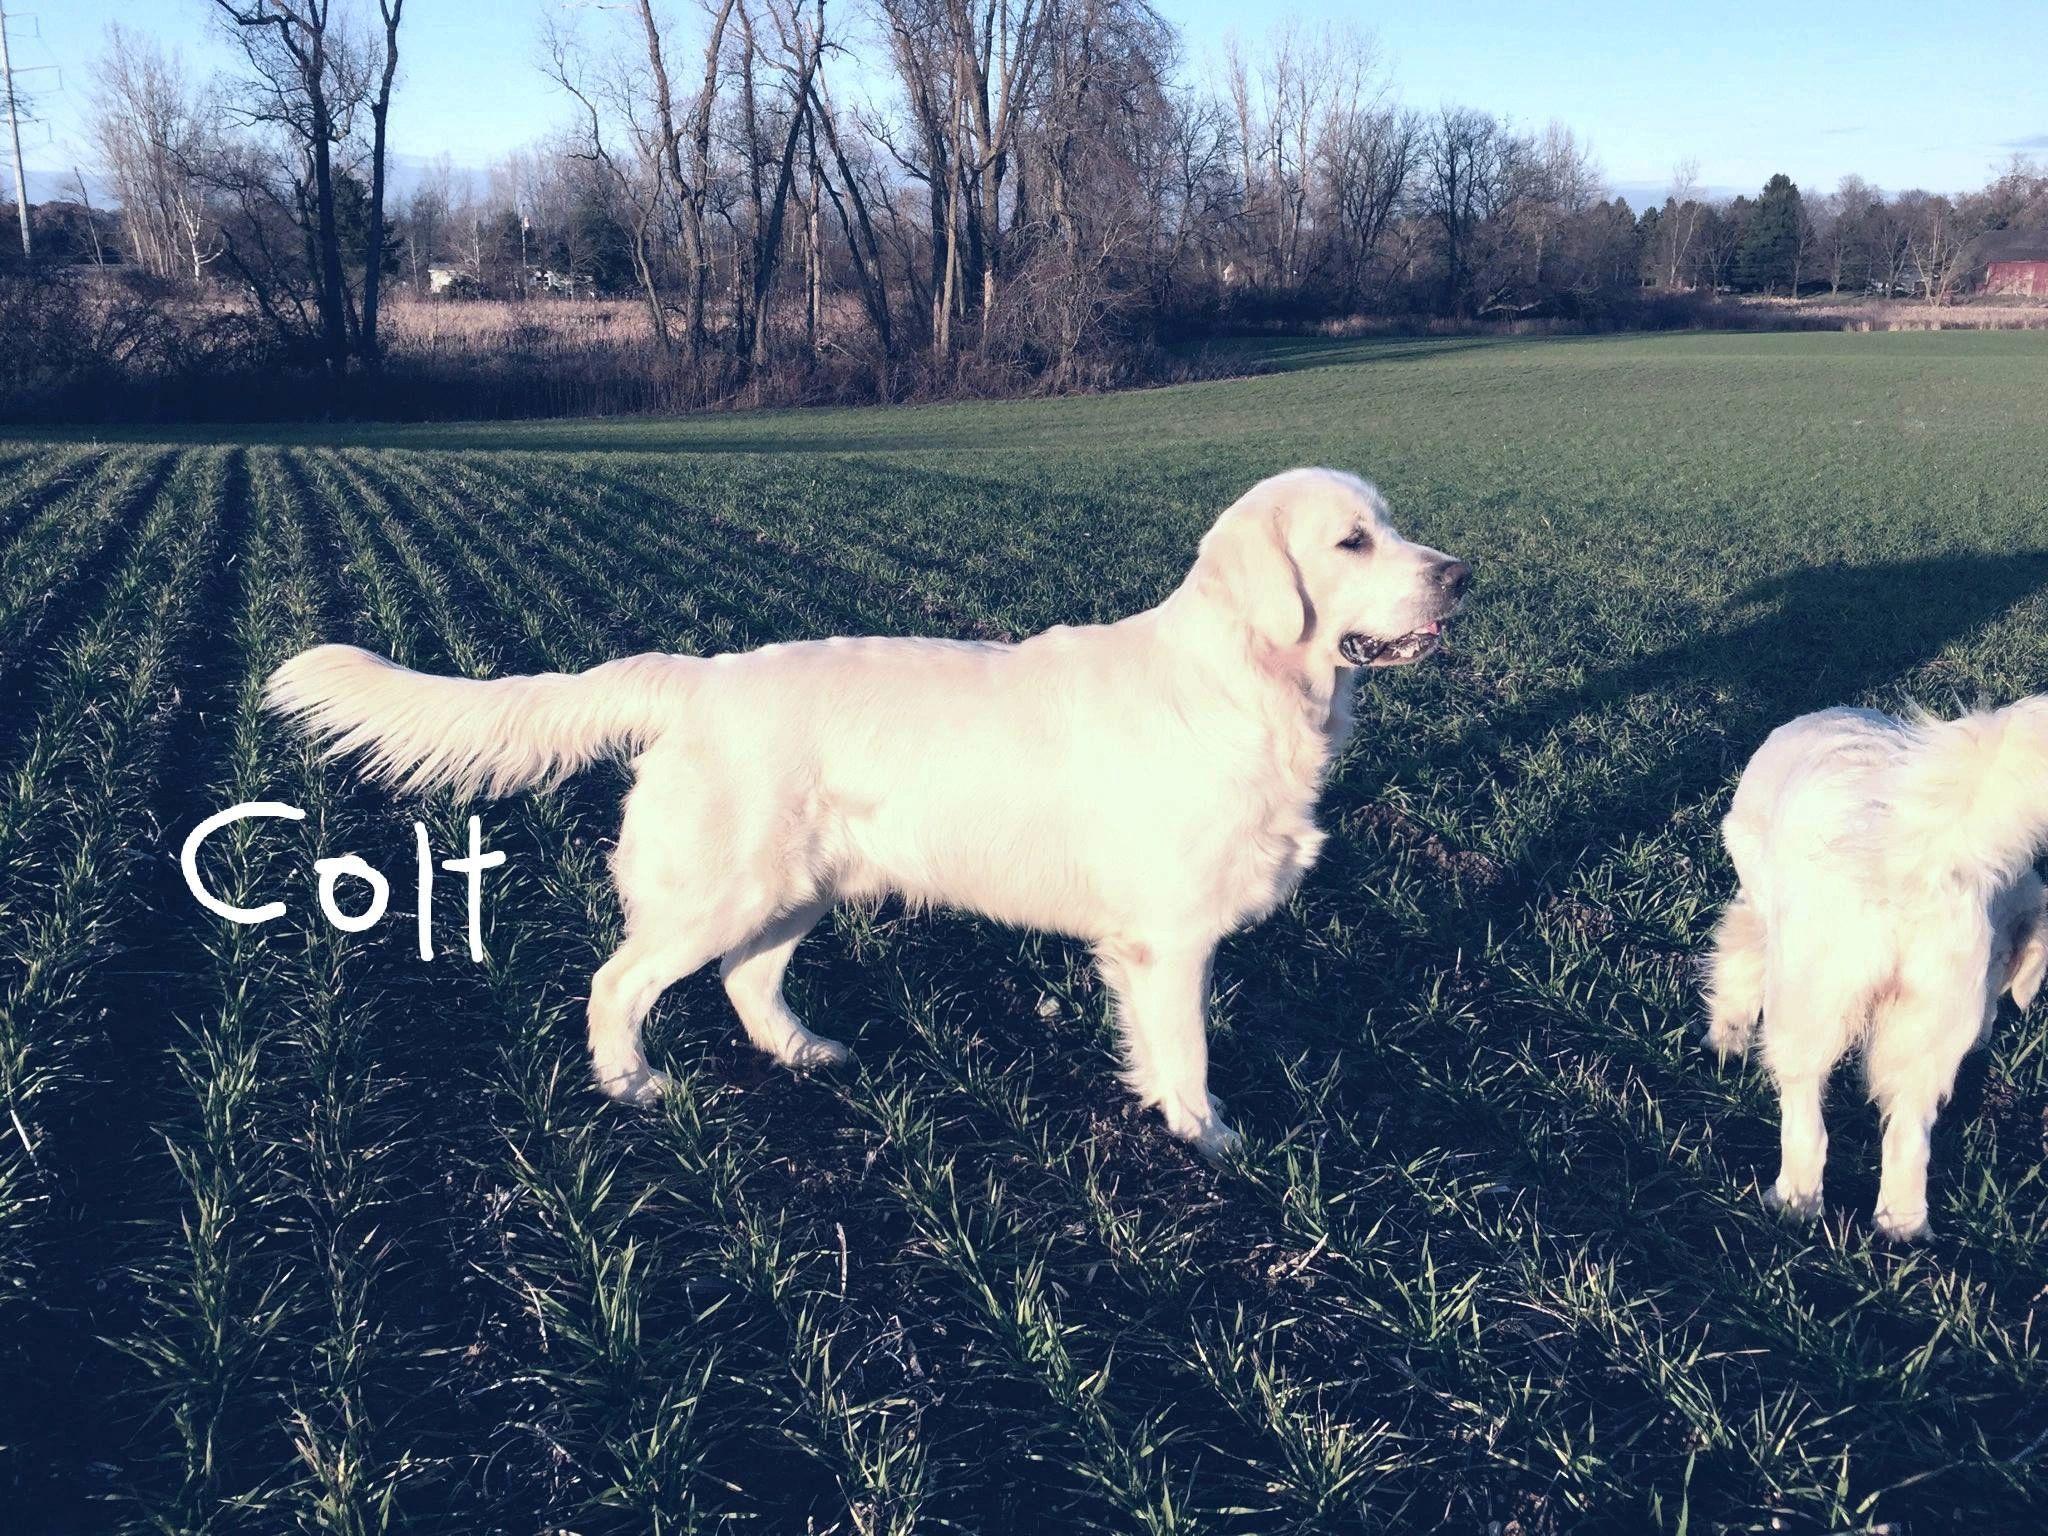 Golden Retriever Puppies For Sale Michigan A Small Farm Specializing In Pre Spoiled English Style Golde Dogs Golden Retriever Golden Retriever Retriever Puppy